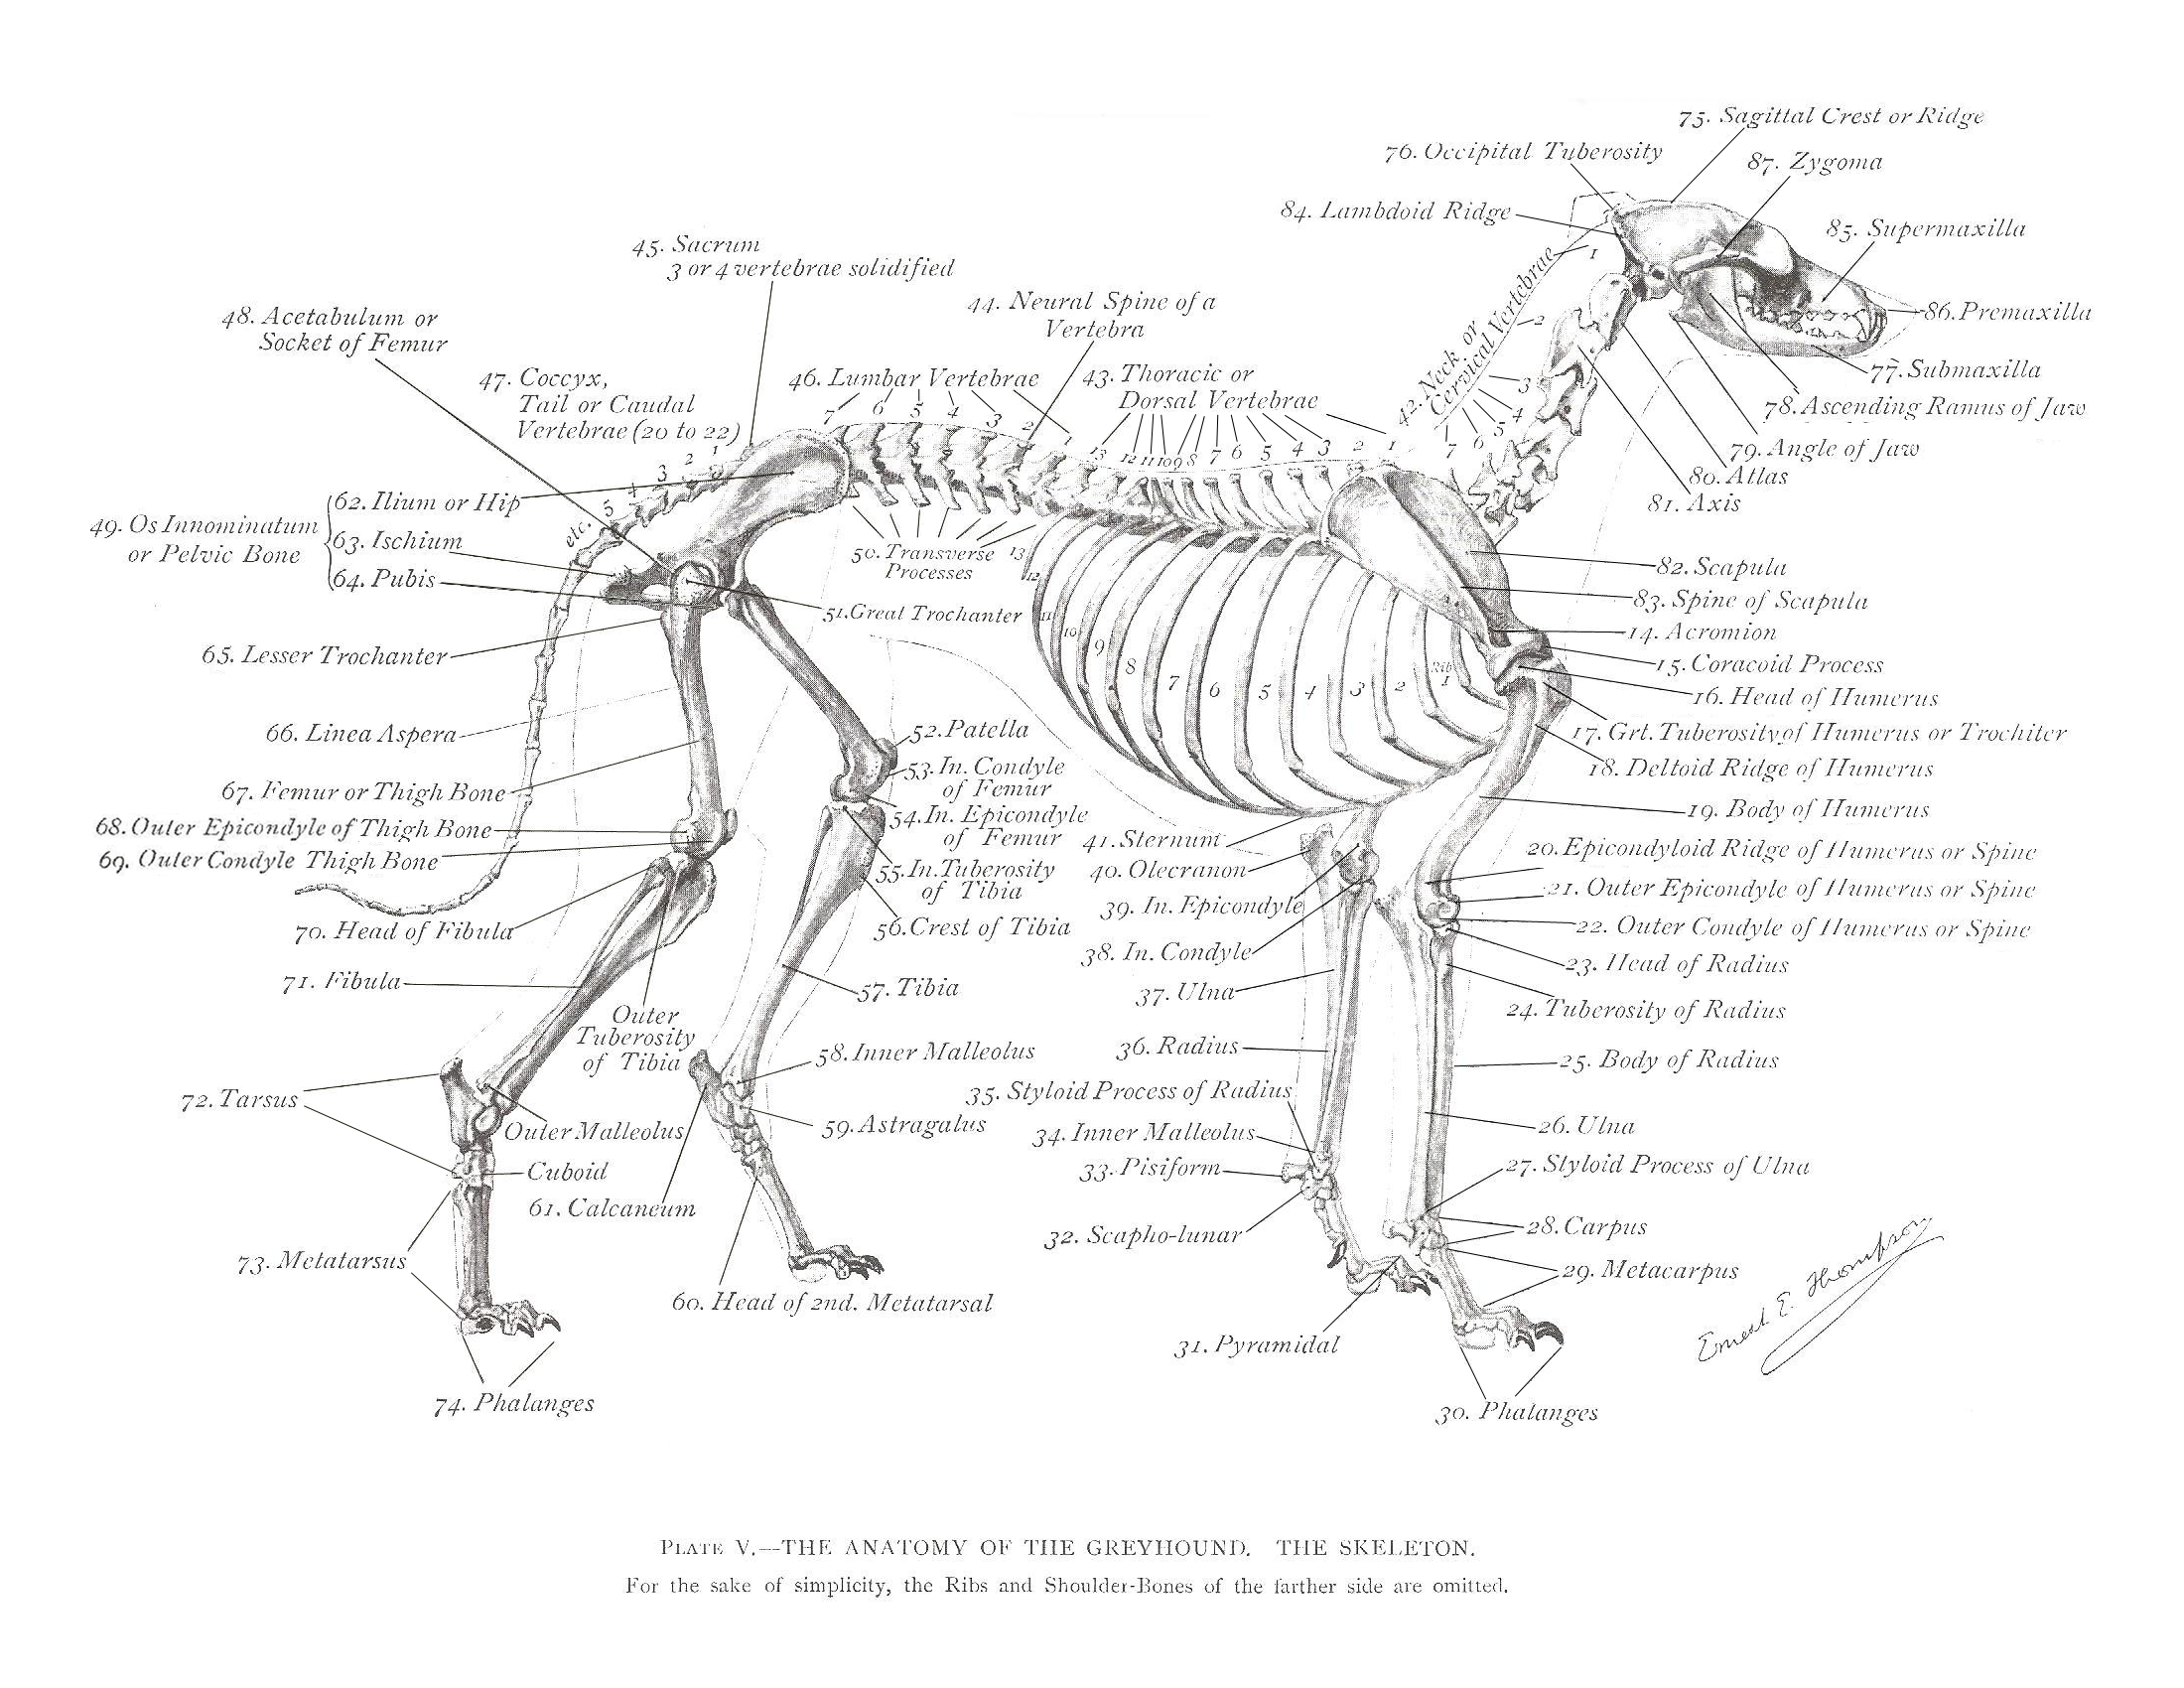 Greyhound Anatomy Diagram  The Skeleton  Click The Link To Get This  Greyhound Anatomy Print